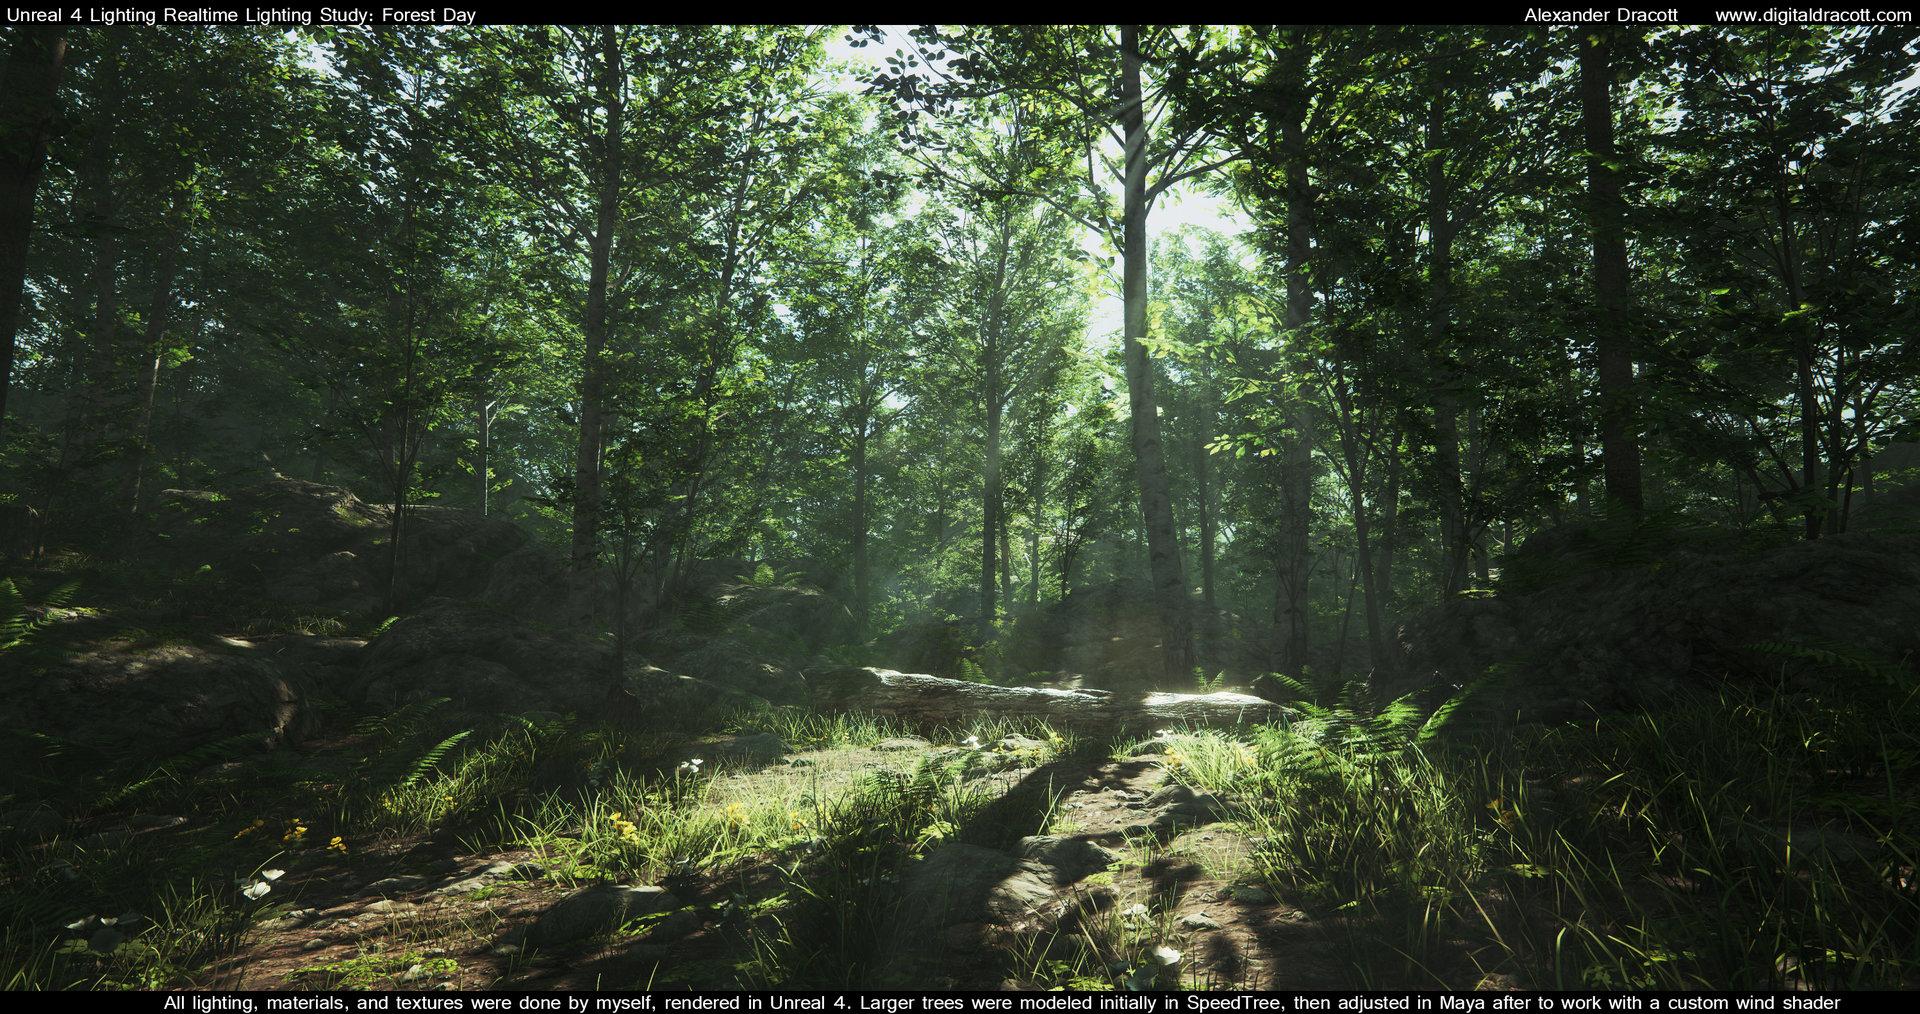 Alexander dracott forest 001